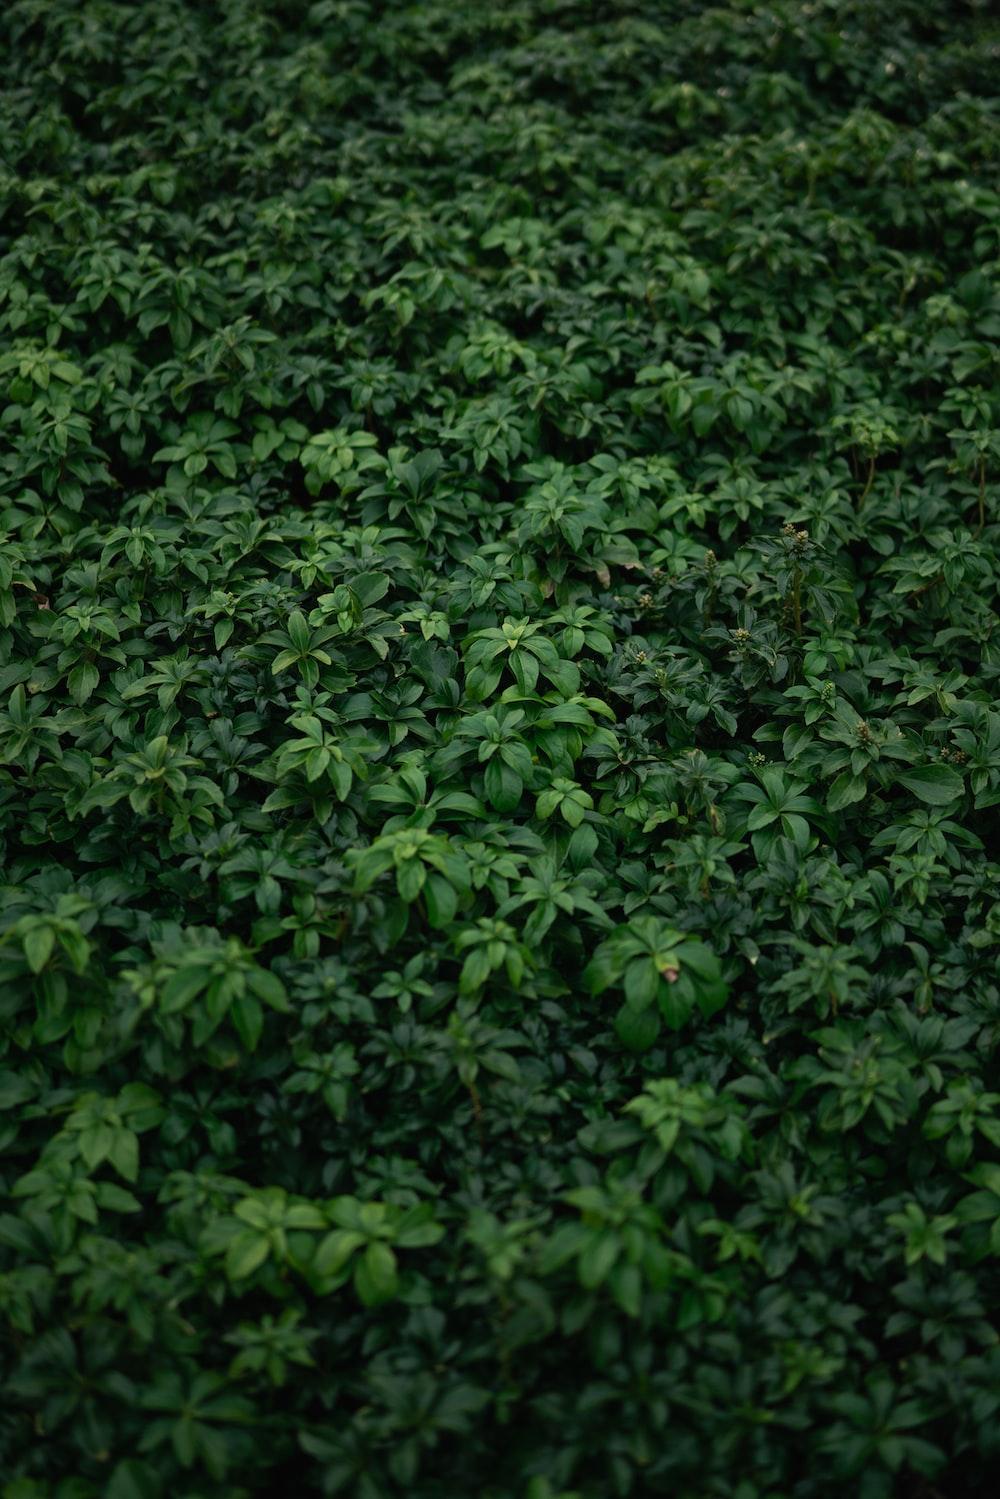 green leaves on brown soil